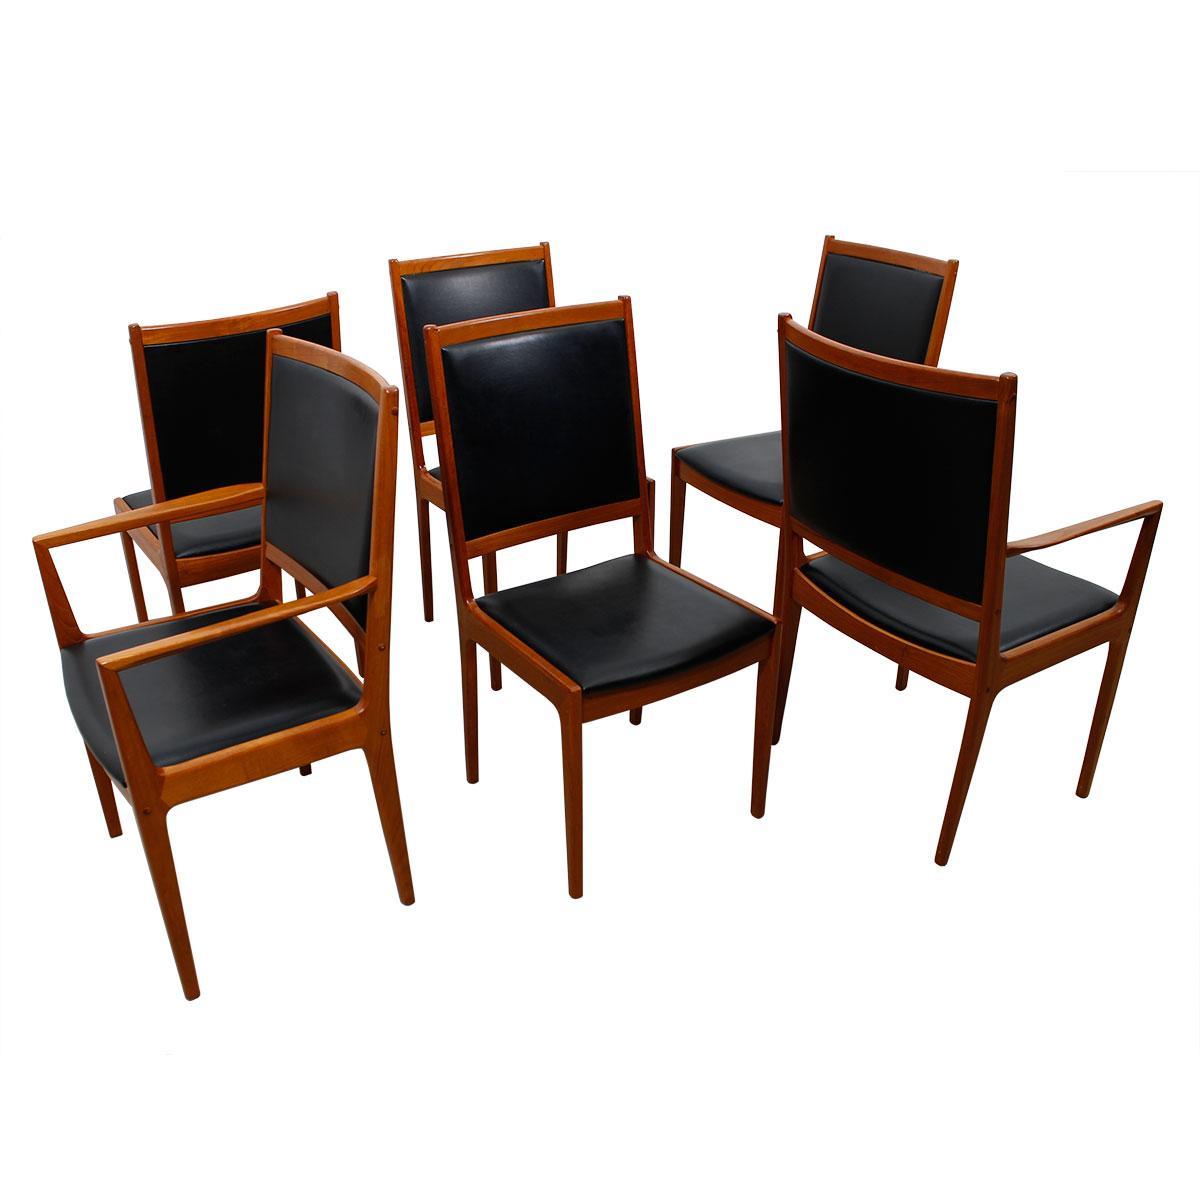 Rare kofod larsen tall wide danish modern teak dining for Modern dining chairs ireland